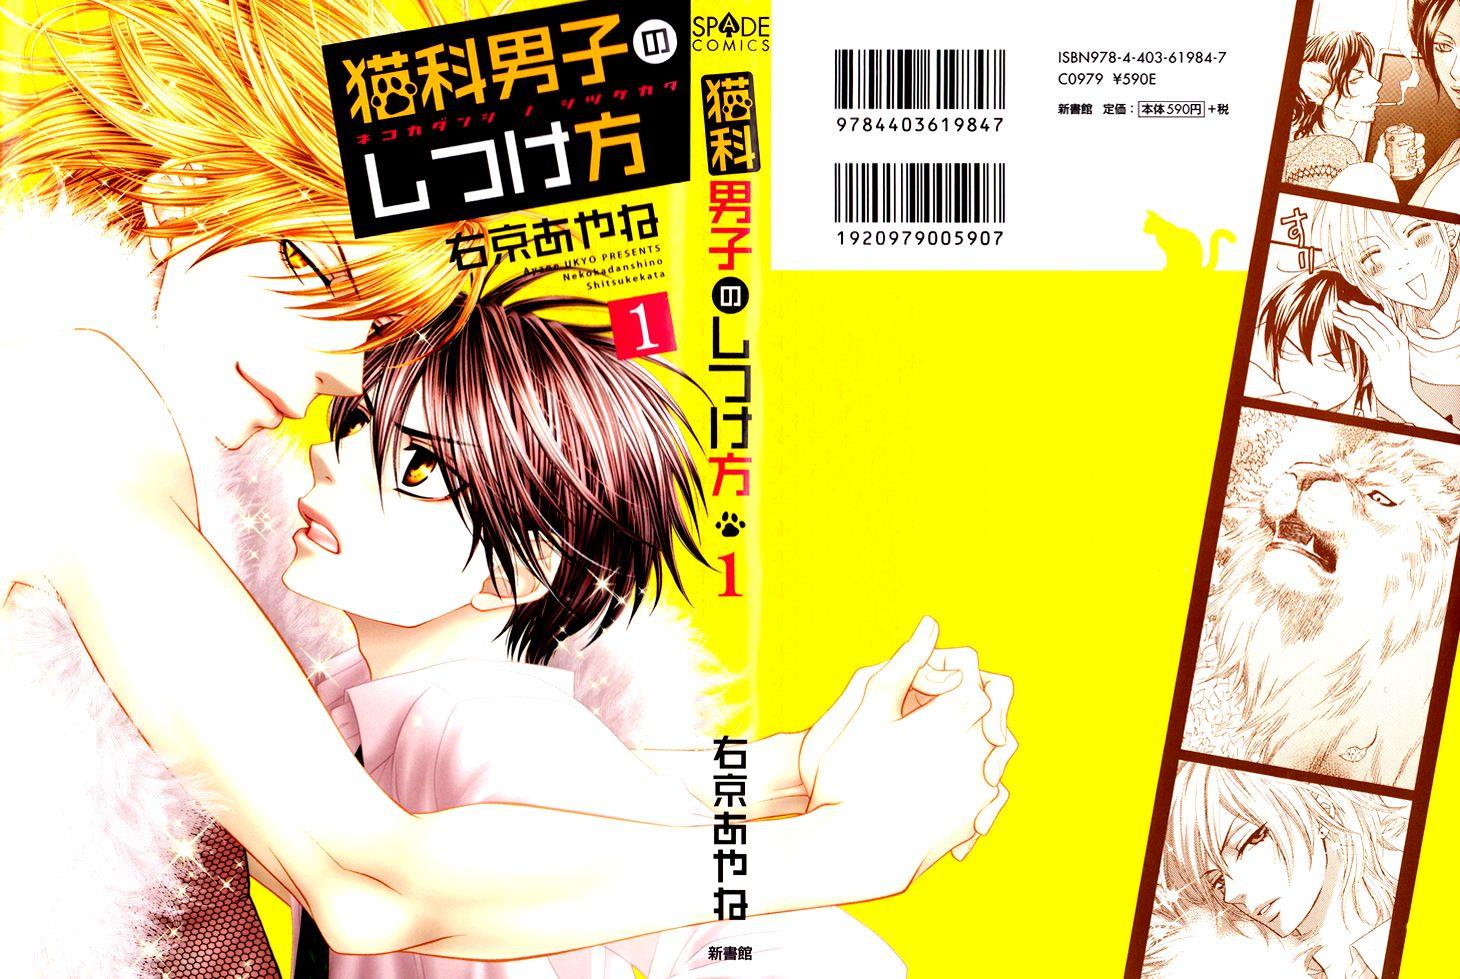 https://c9.mangatag.com/es_manga/pic3/7/20295/590582/da6786e347eb16d43ee1dcba0322f91c.jpg Page 1